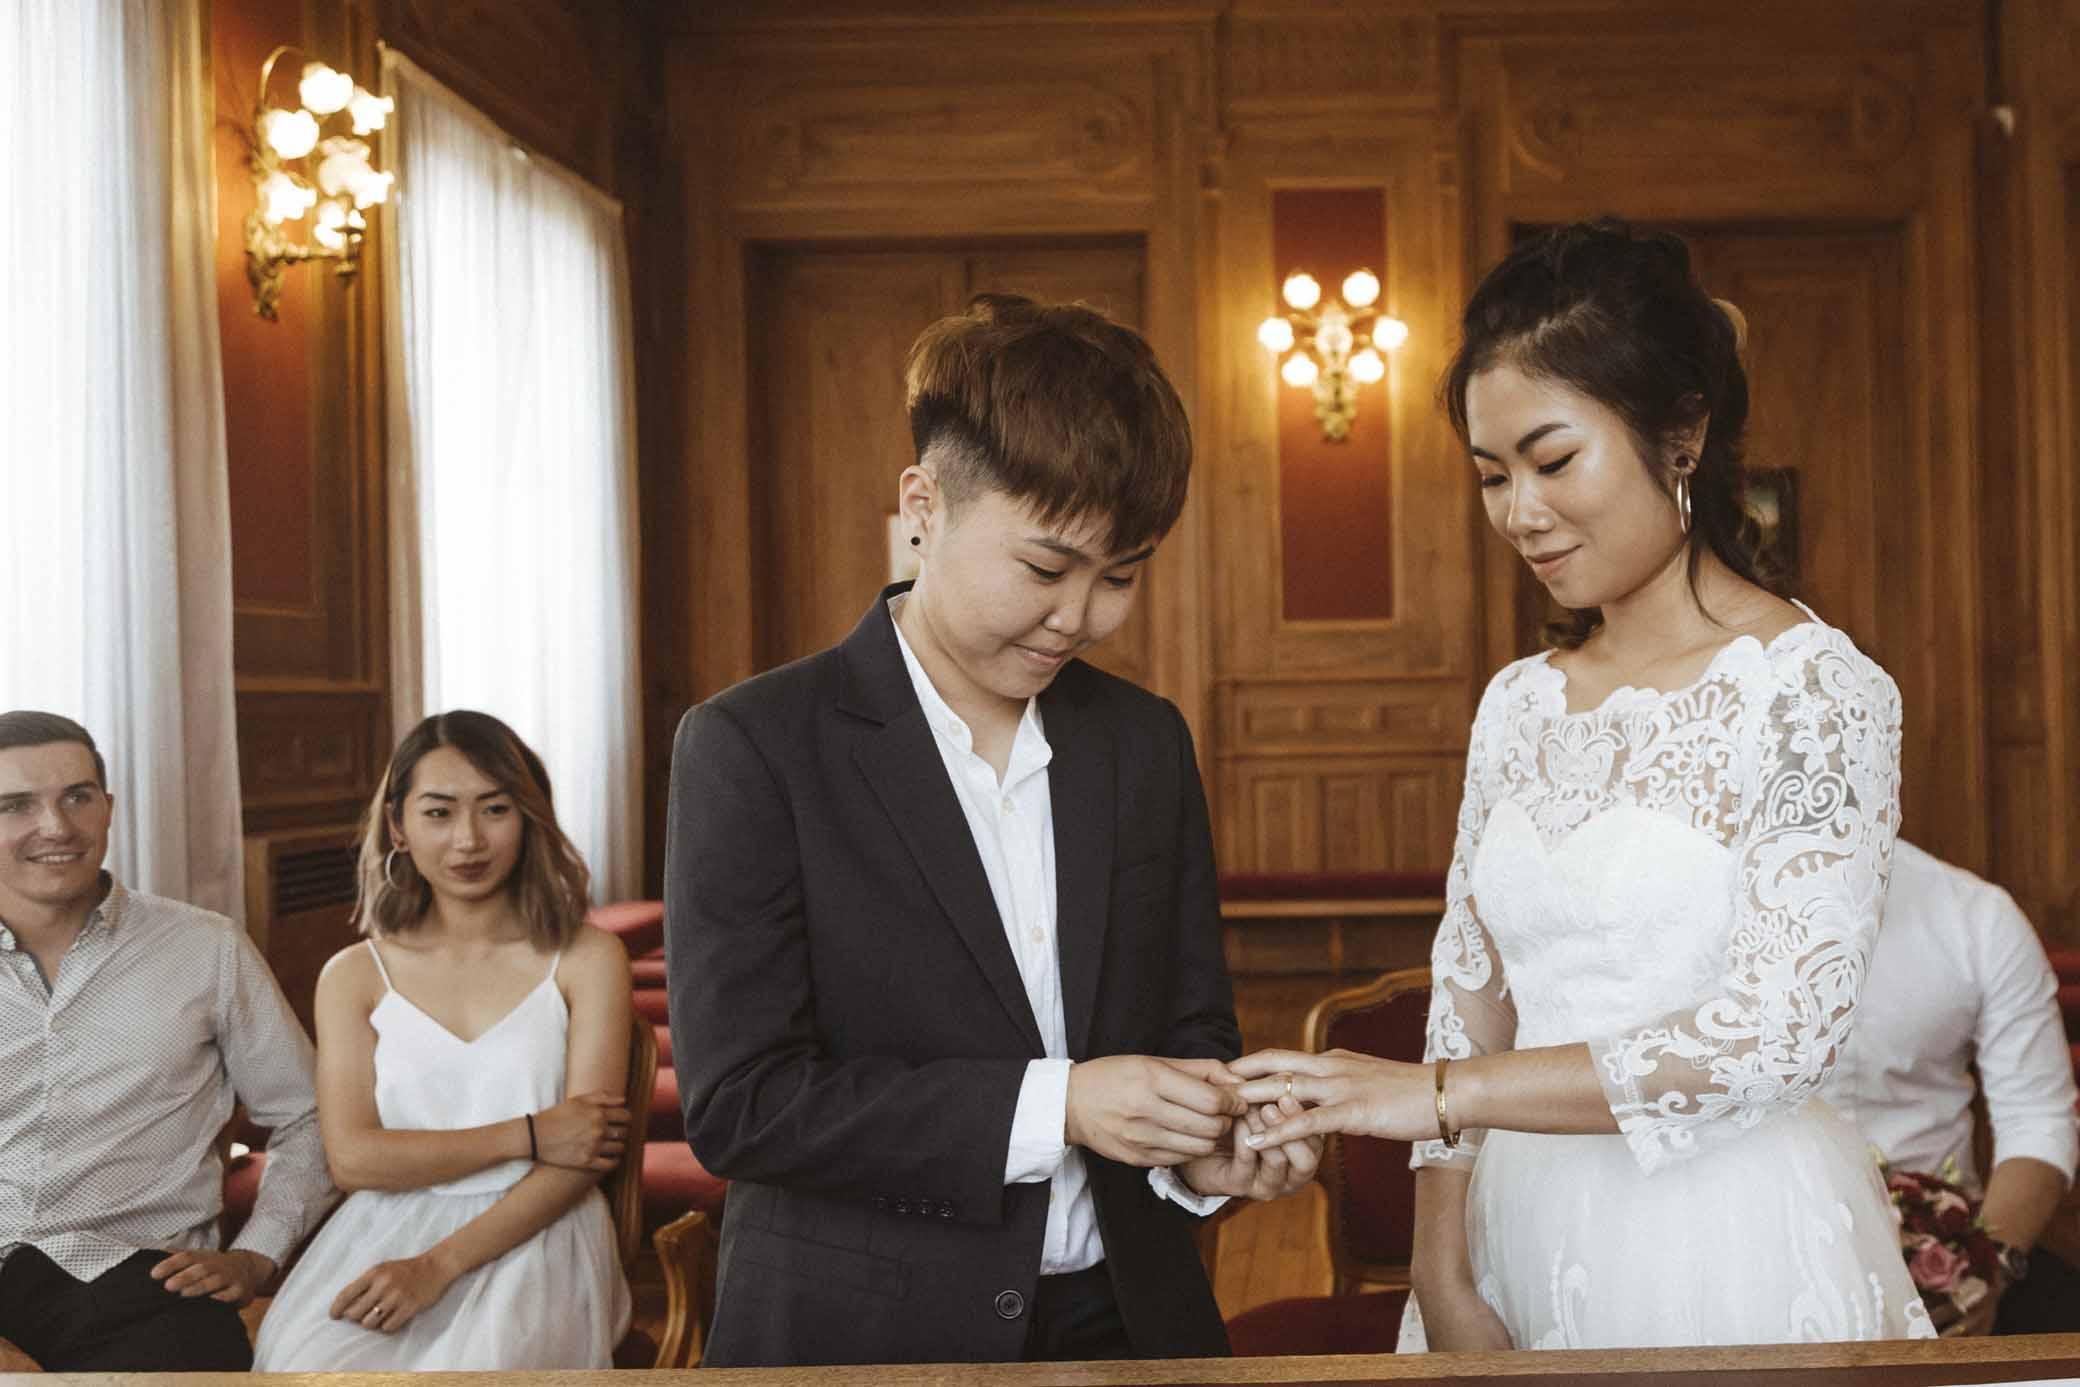 Février Photography lesbian gay same-sex couple lgbt Asian Vietnamese couple wedding marriage Europe France Paris Vietnam elopement Dancing With Her magazine directory